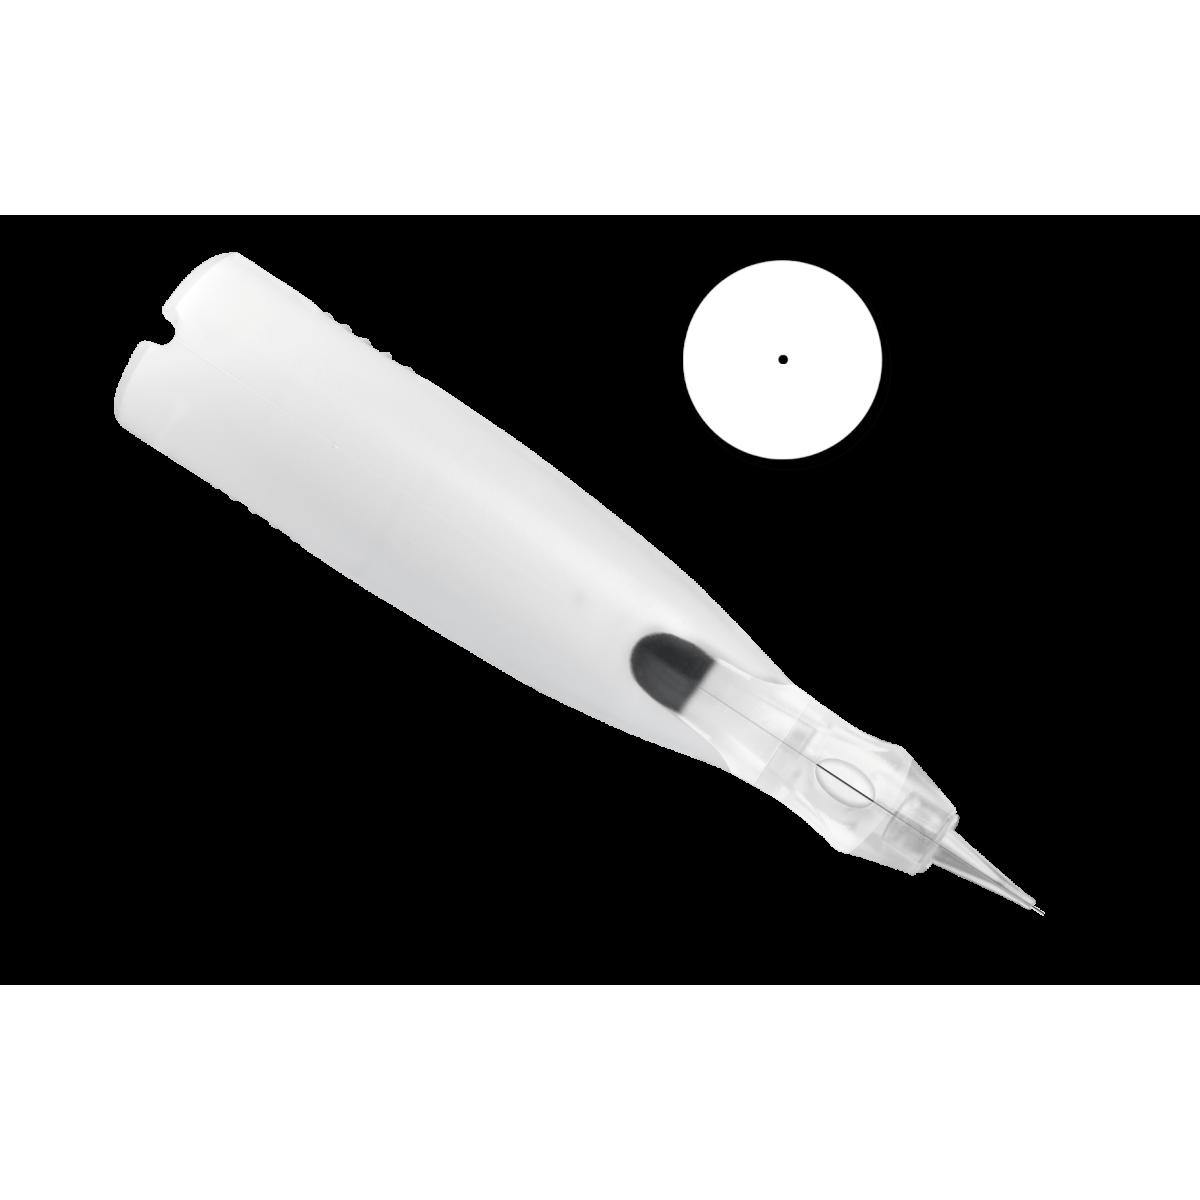 1 NANO N2 (0,25 mm) PRECISE